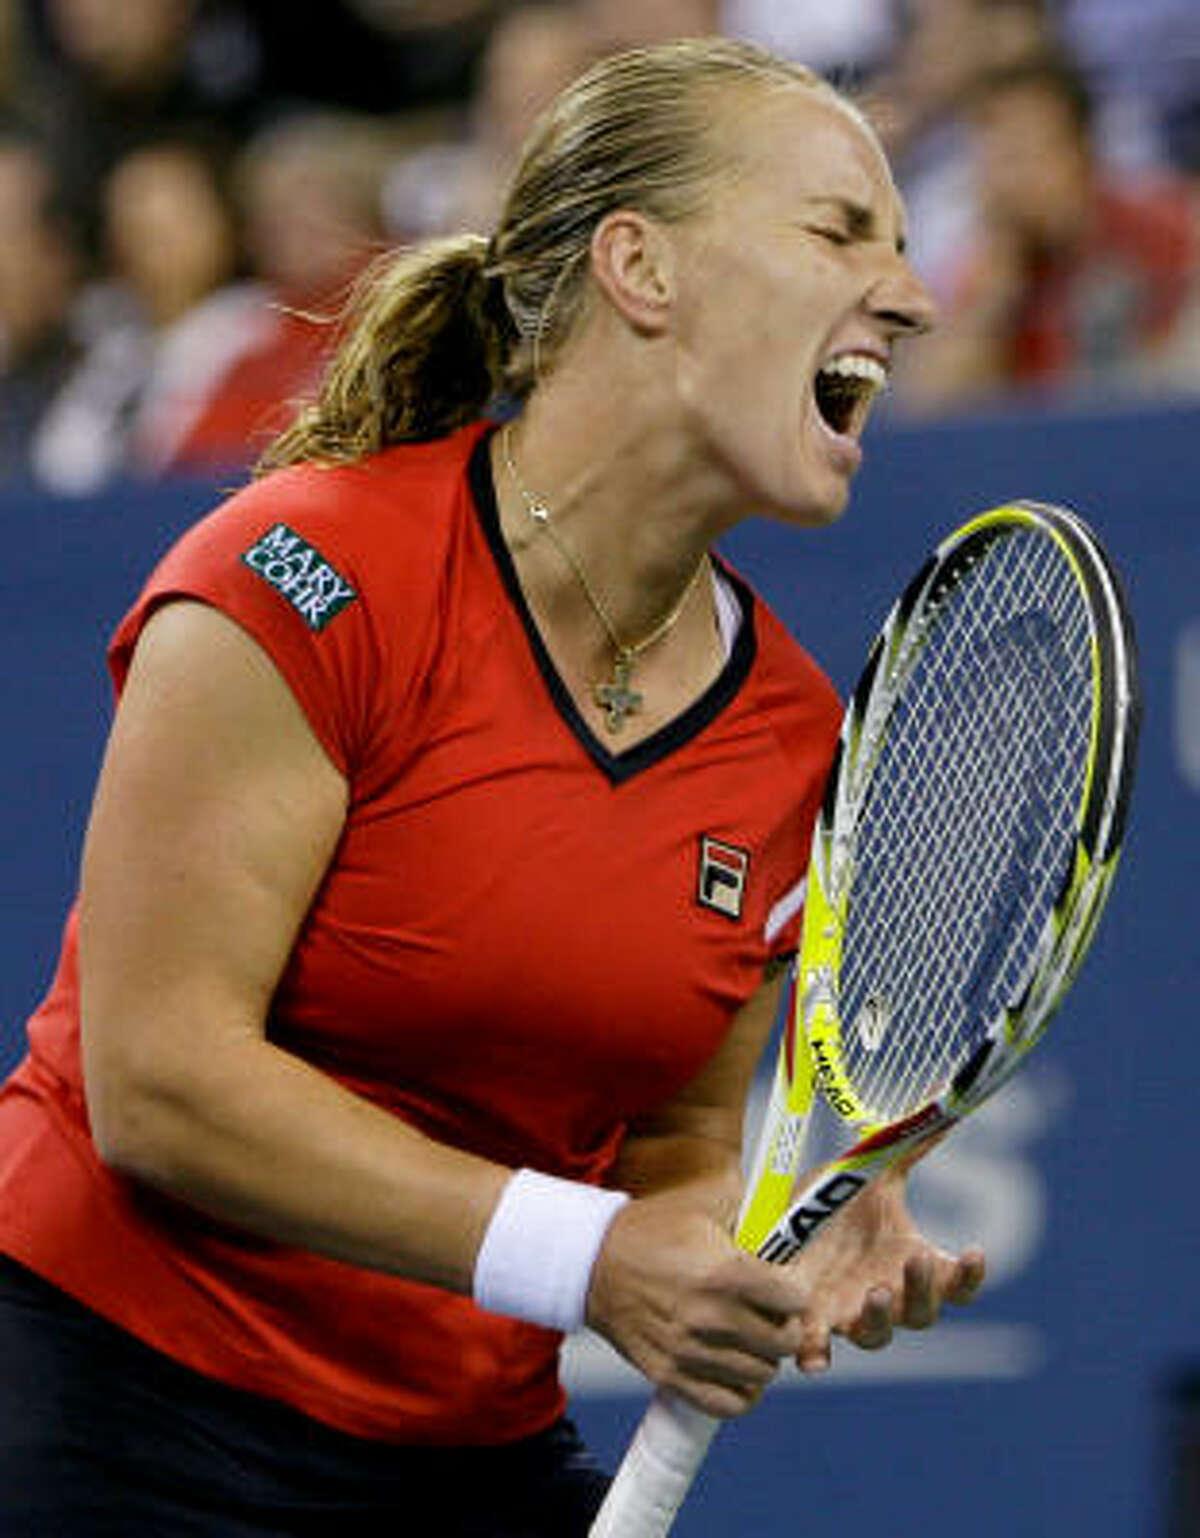 Svetlana Kuznetsova of Russia yells after losing a point to Caroline Wozniacki of Denmark.